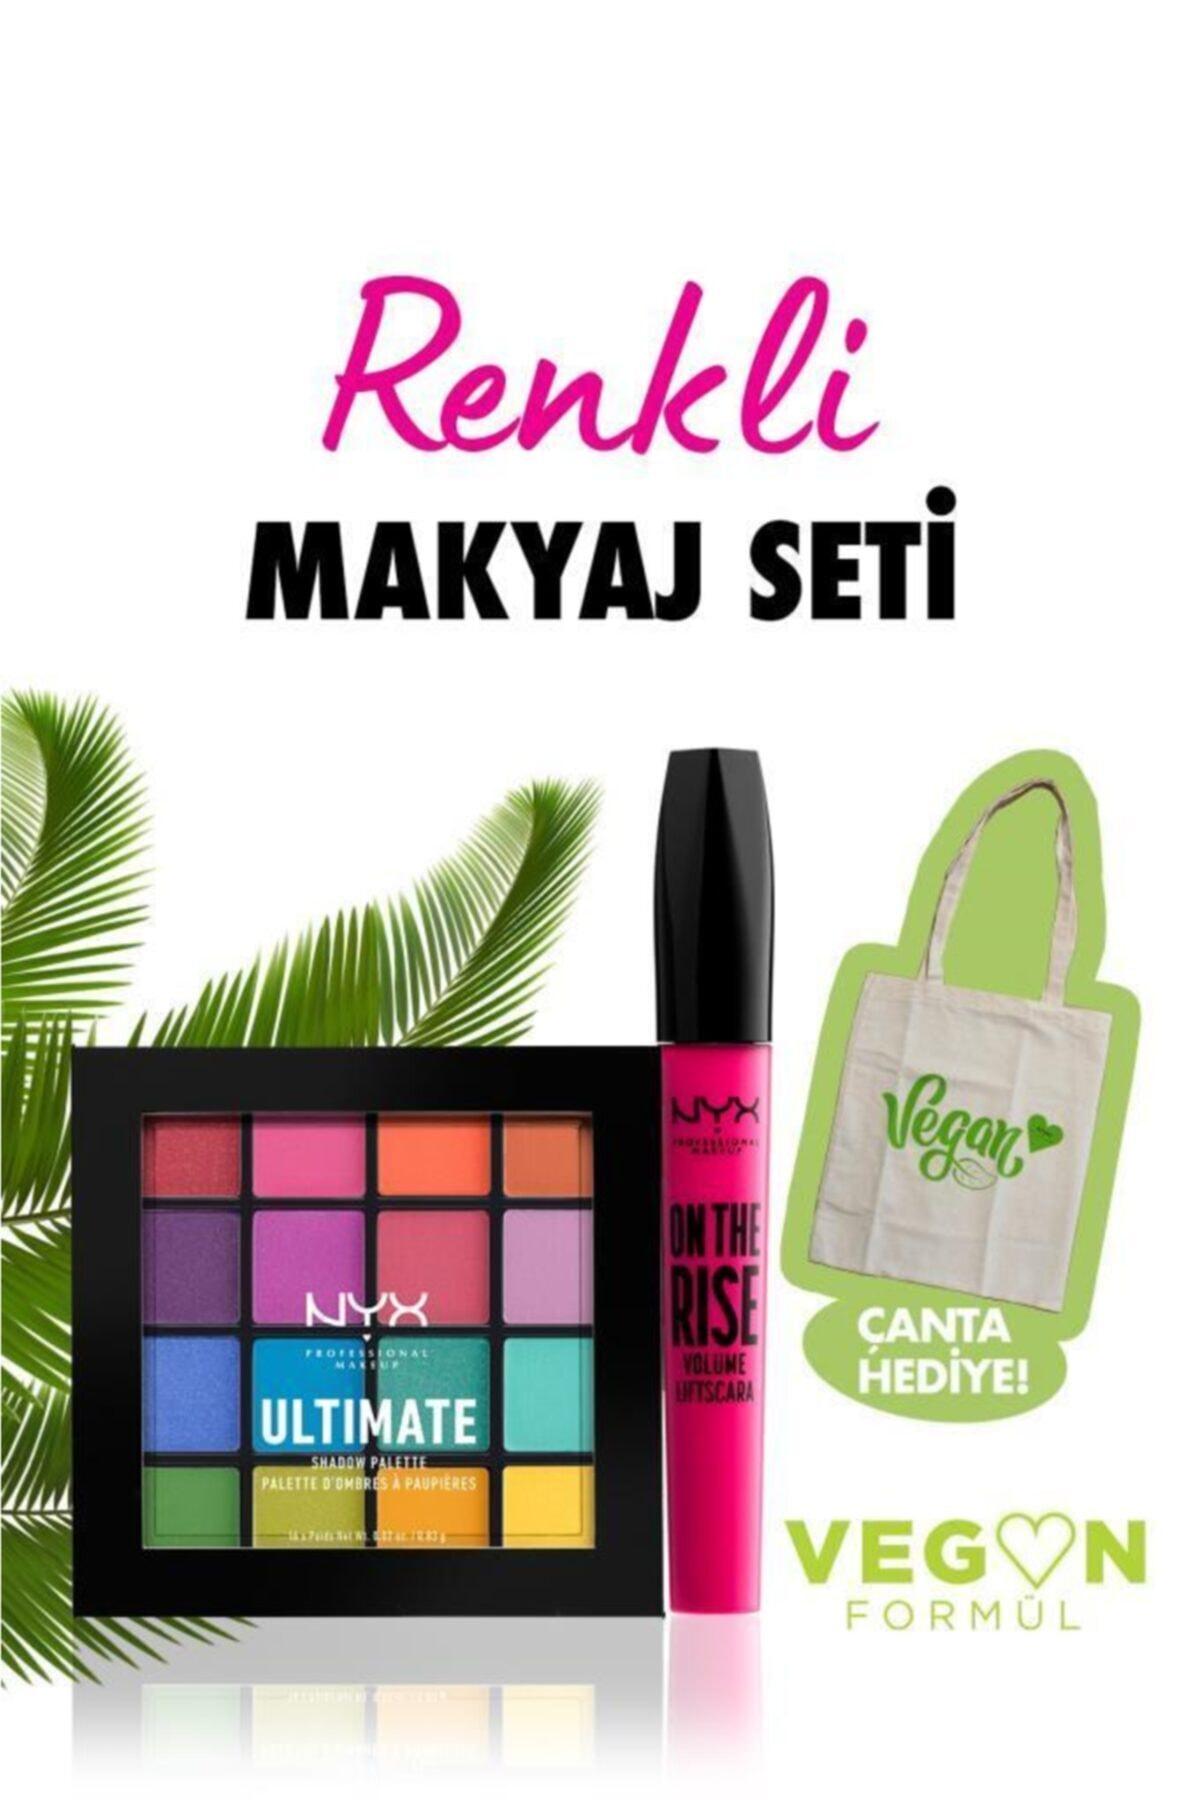 NYX Professional Makeup Vegan Renkli Makyaj Seti & Çanta Hediyeli 1